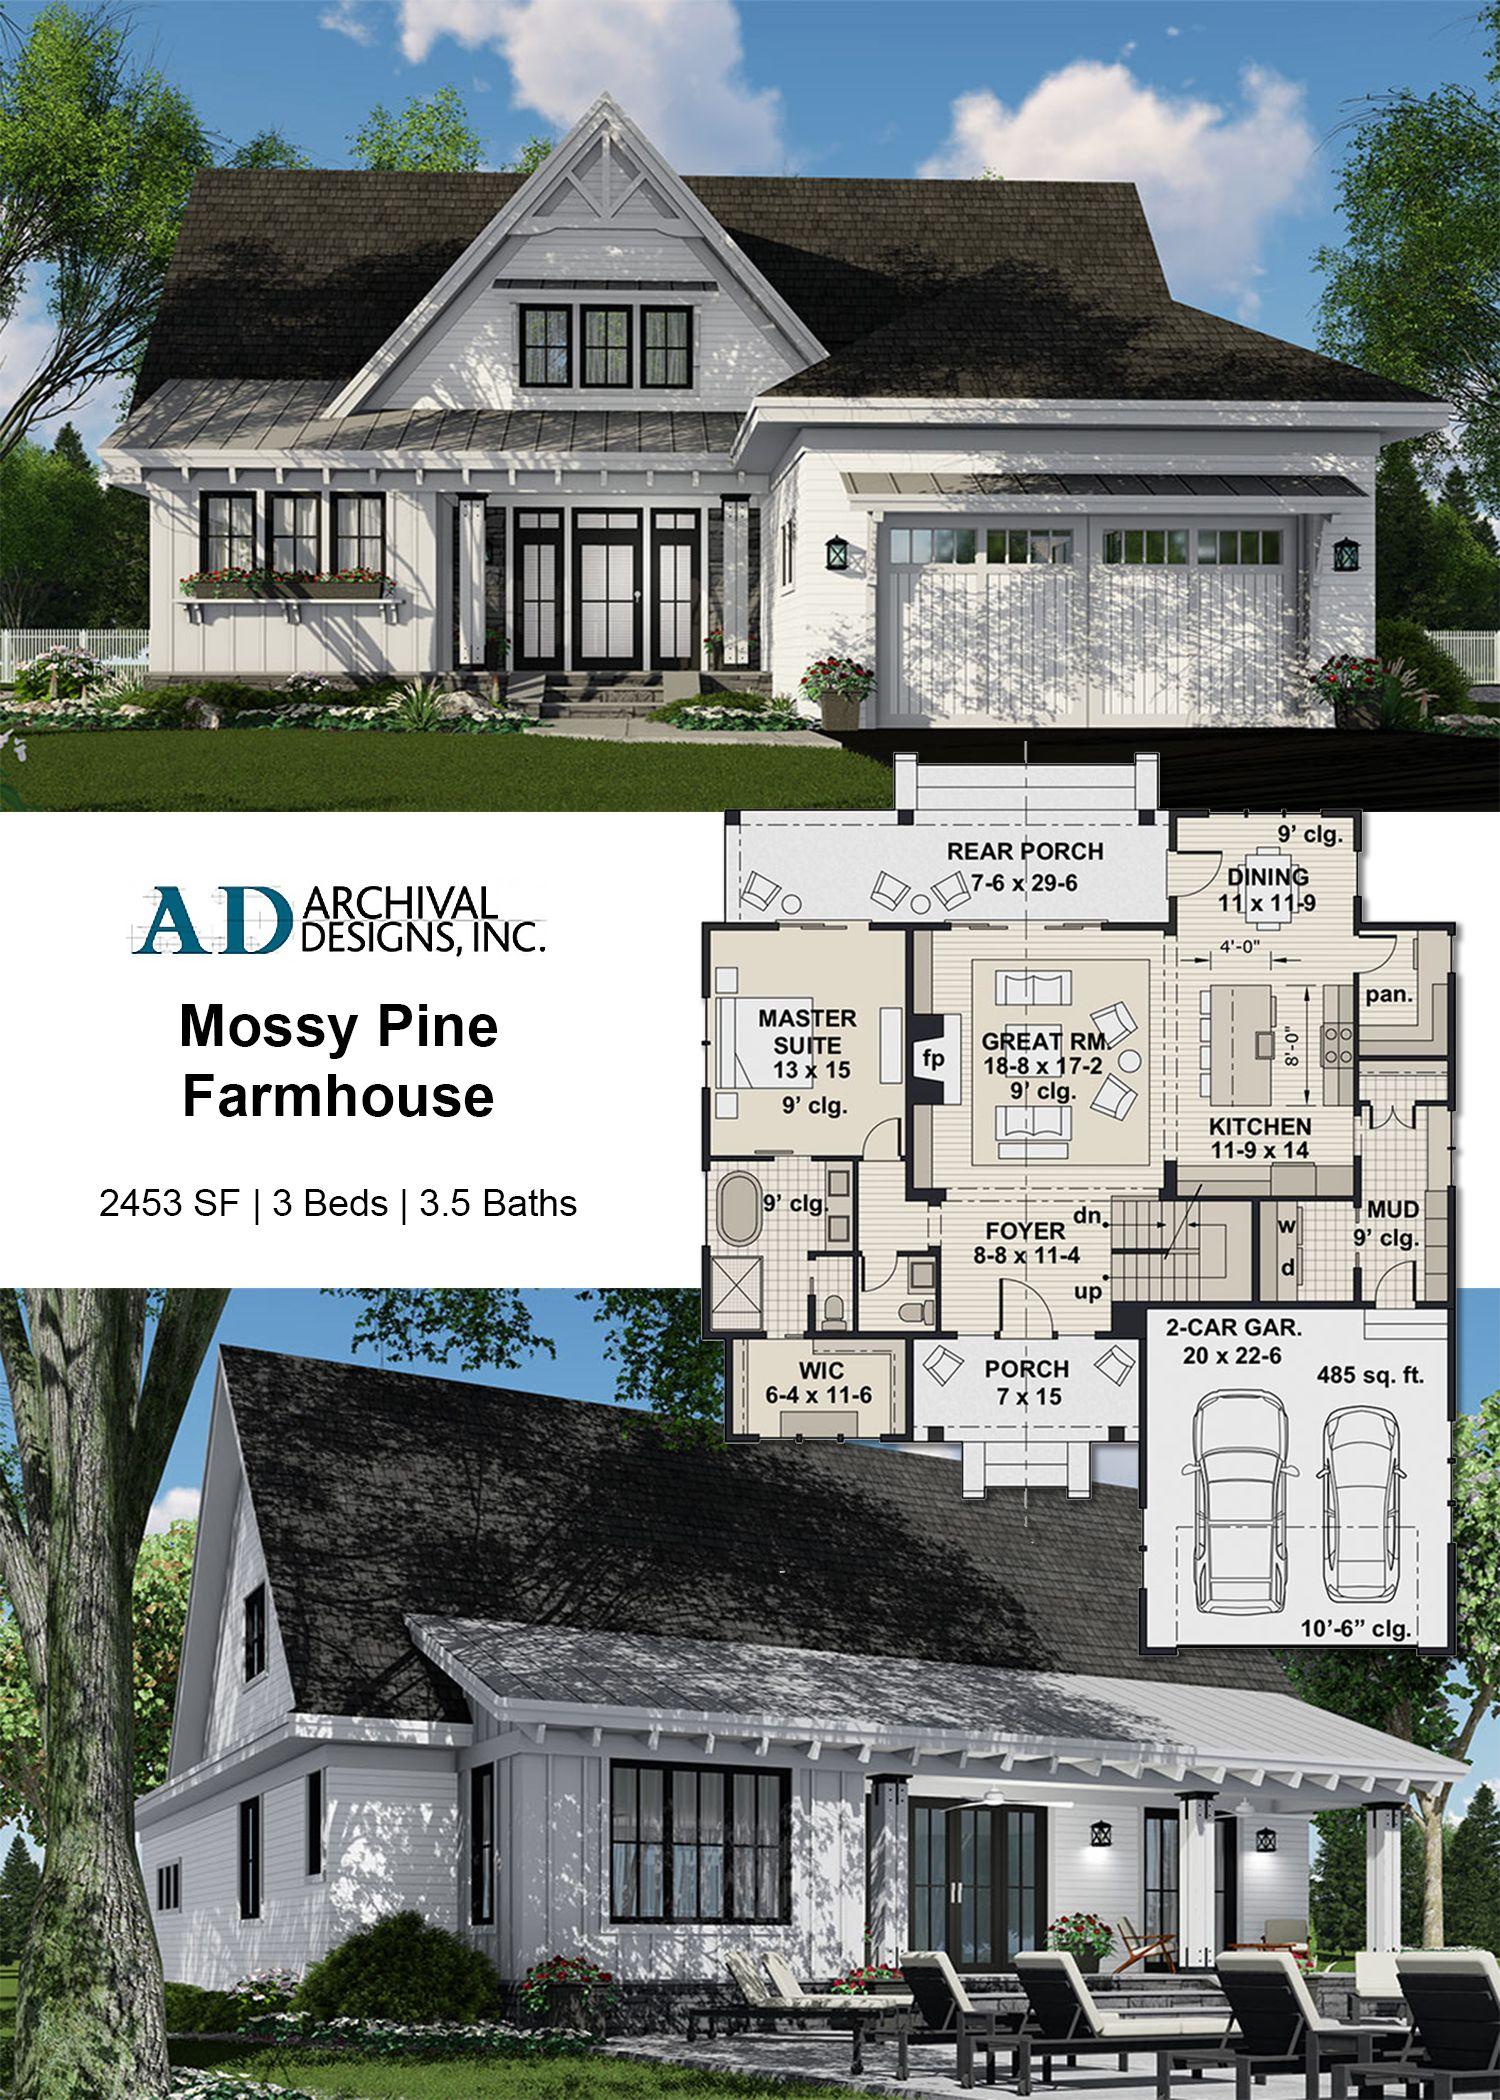 Mossy Pine Farm House Plan Craftsman House Plans Small Farmhouse Plans Farmhouse Plans